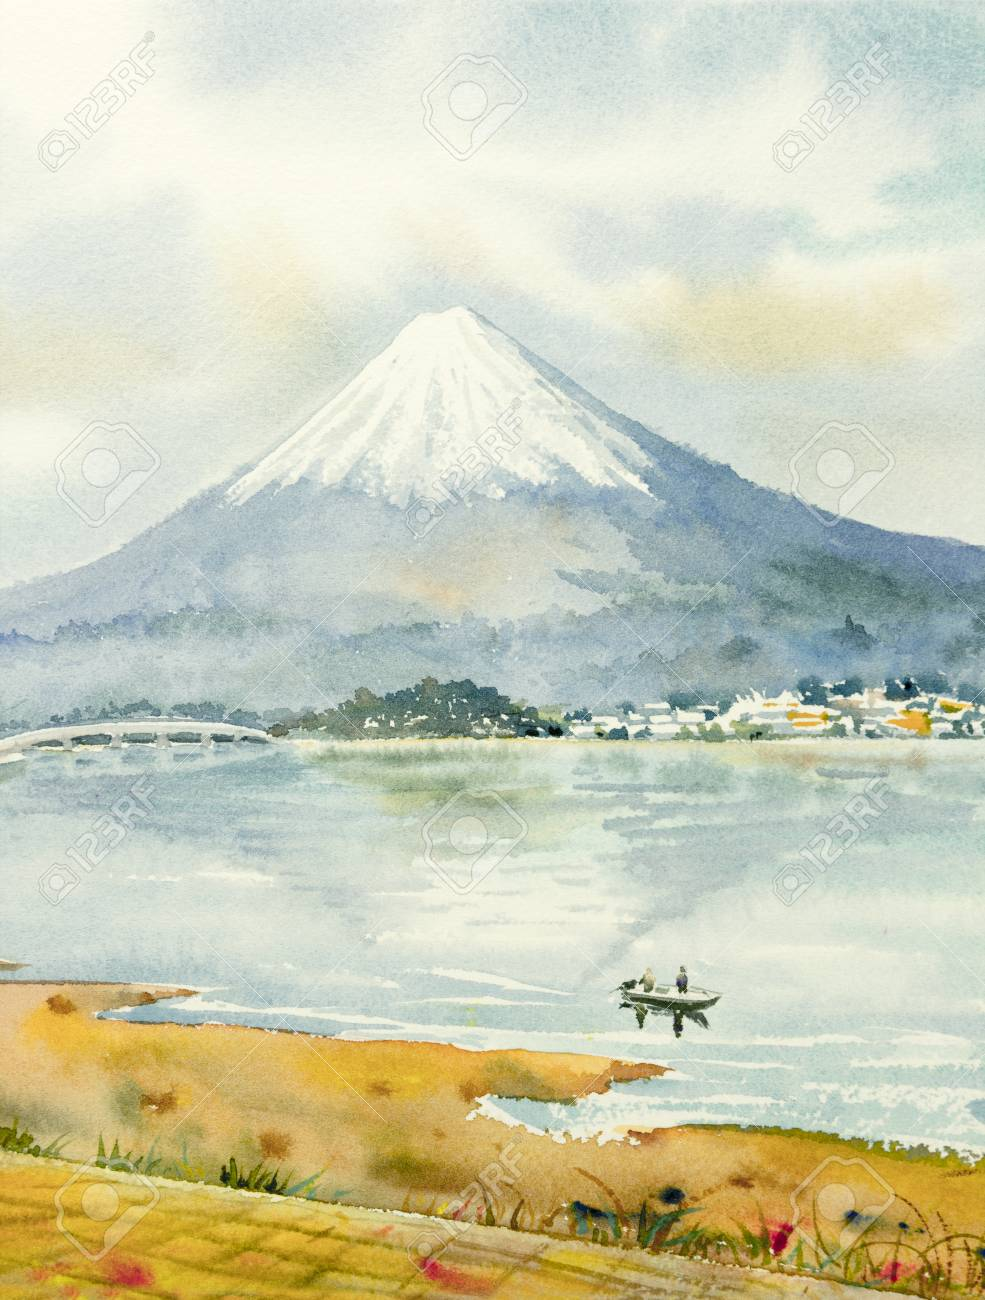 Mount Fuji Lake Kawaguchiko Famous Landmark Of Japan Watercolor Stock Photo Picture And Royalty Free Image Image 101525423